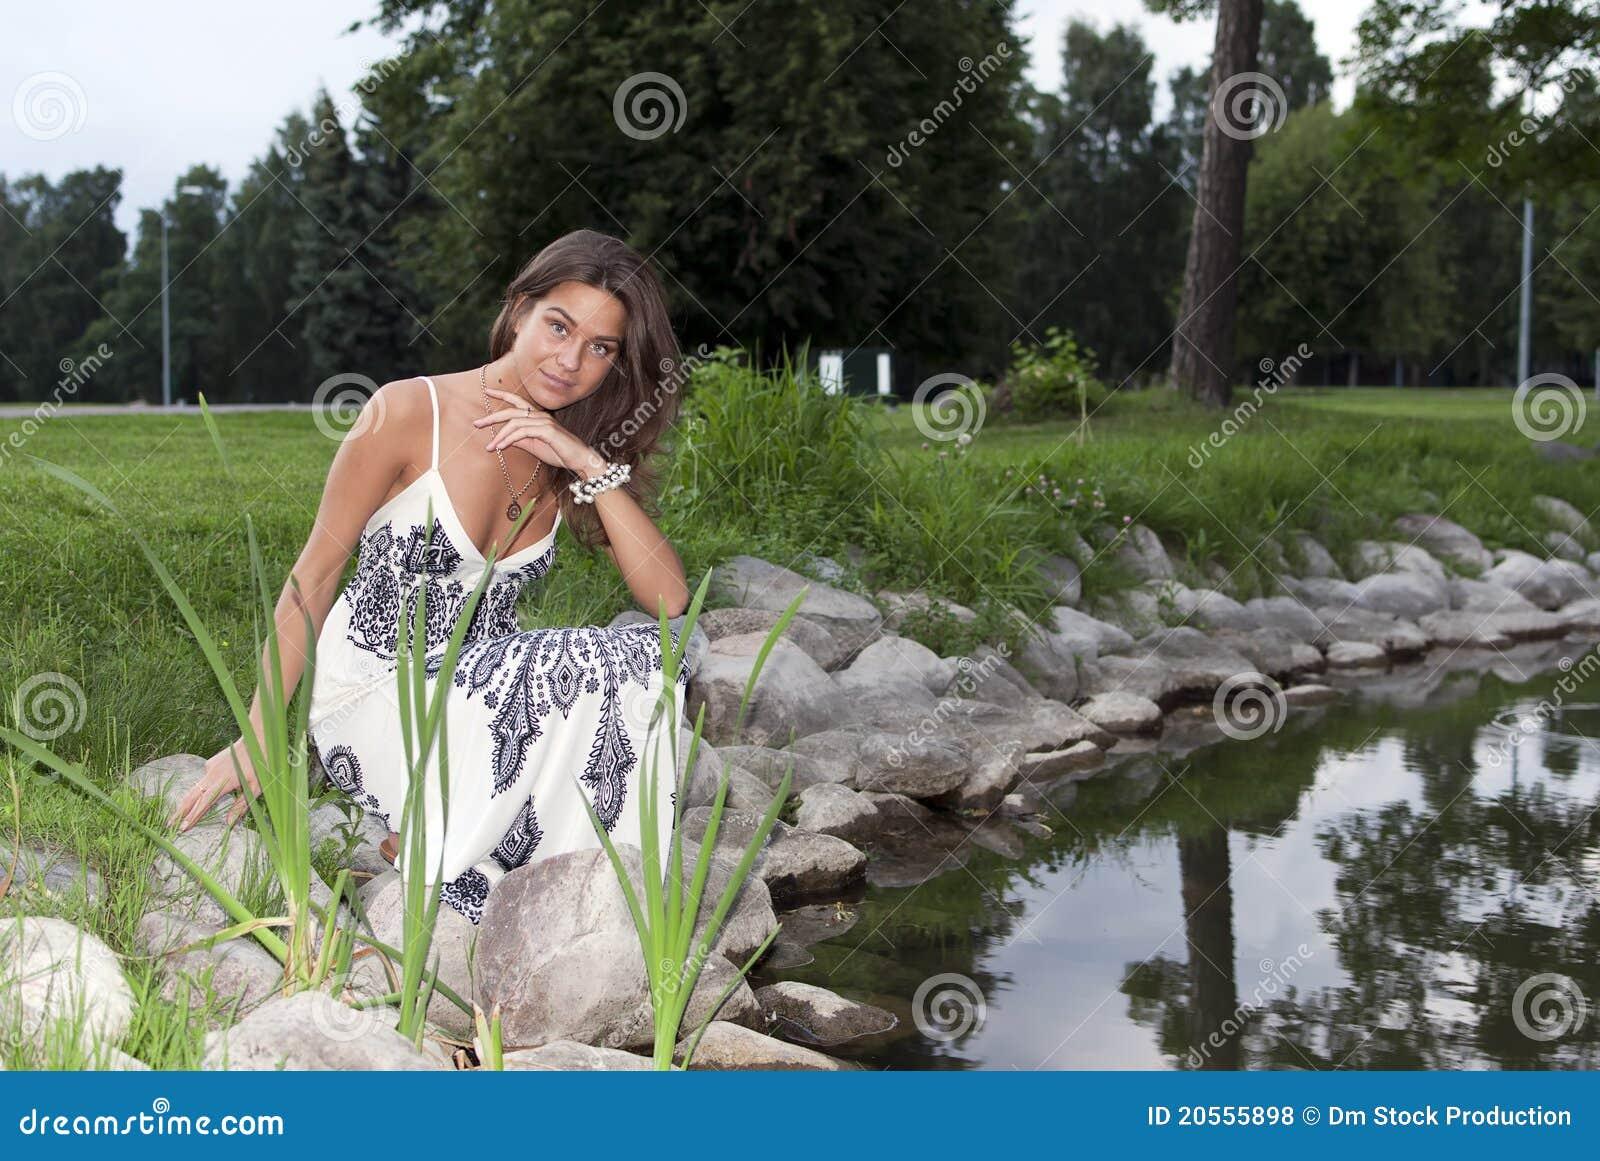 Зрелая на пруду девки фото зденка подкапова самолете